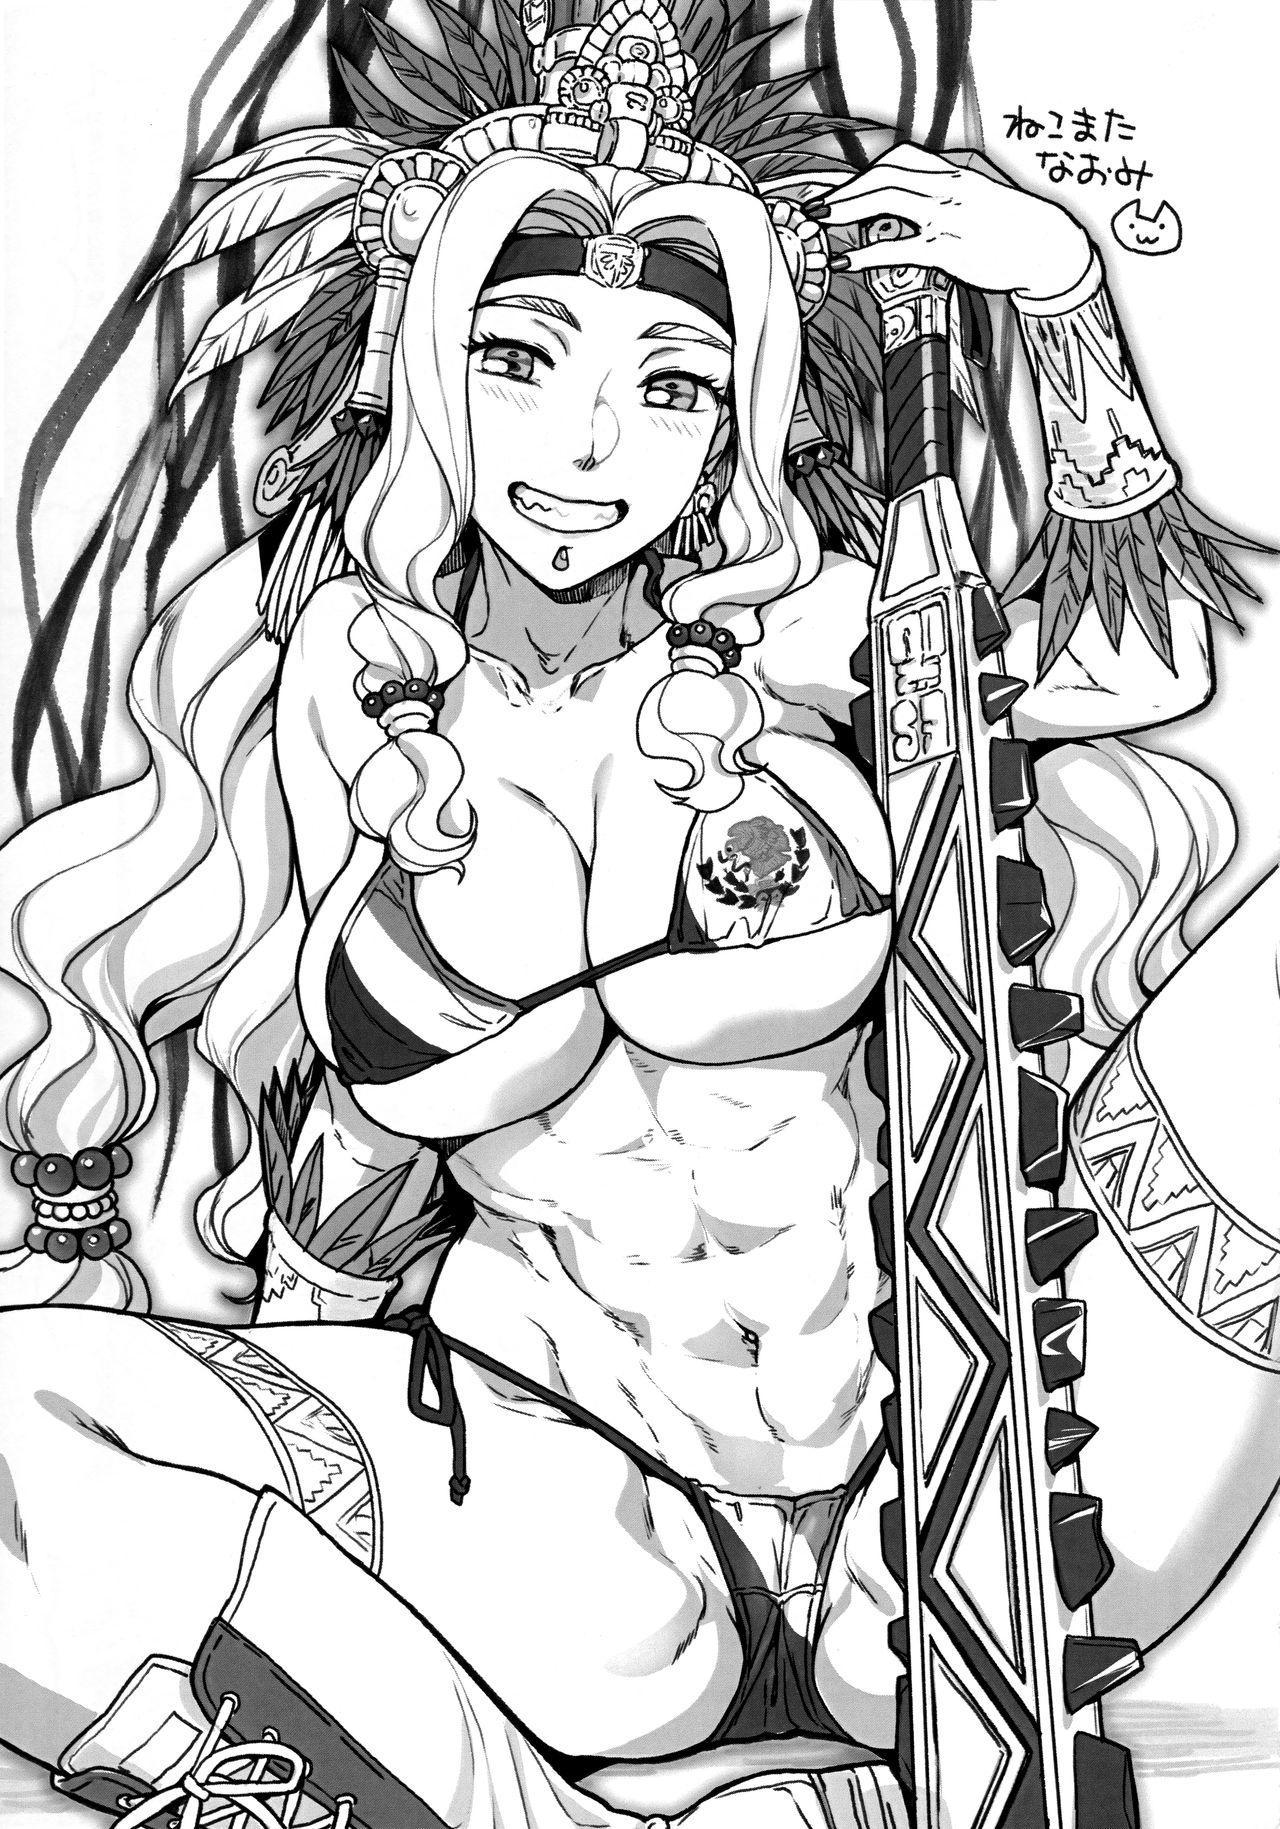 Megami ga Mizugi ni Kigaetara 15